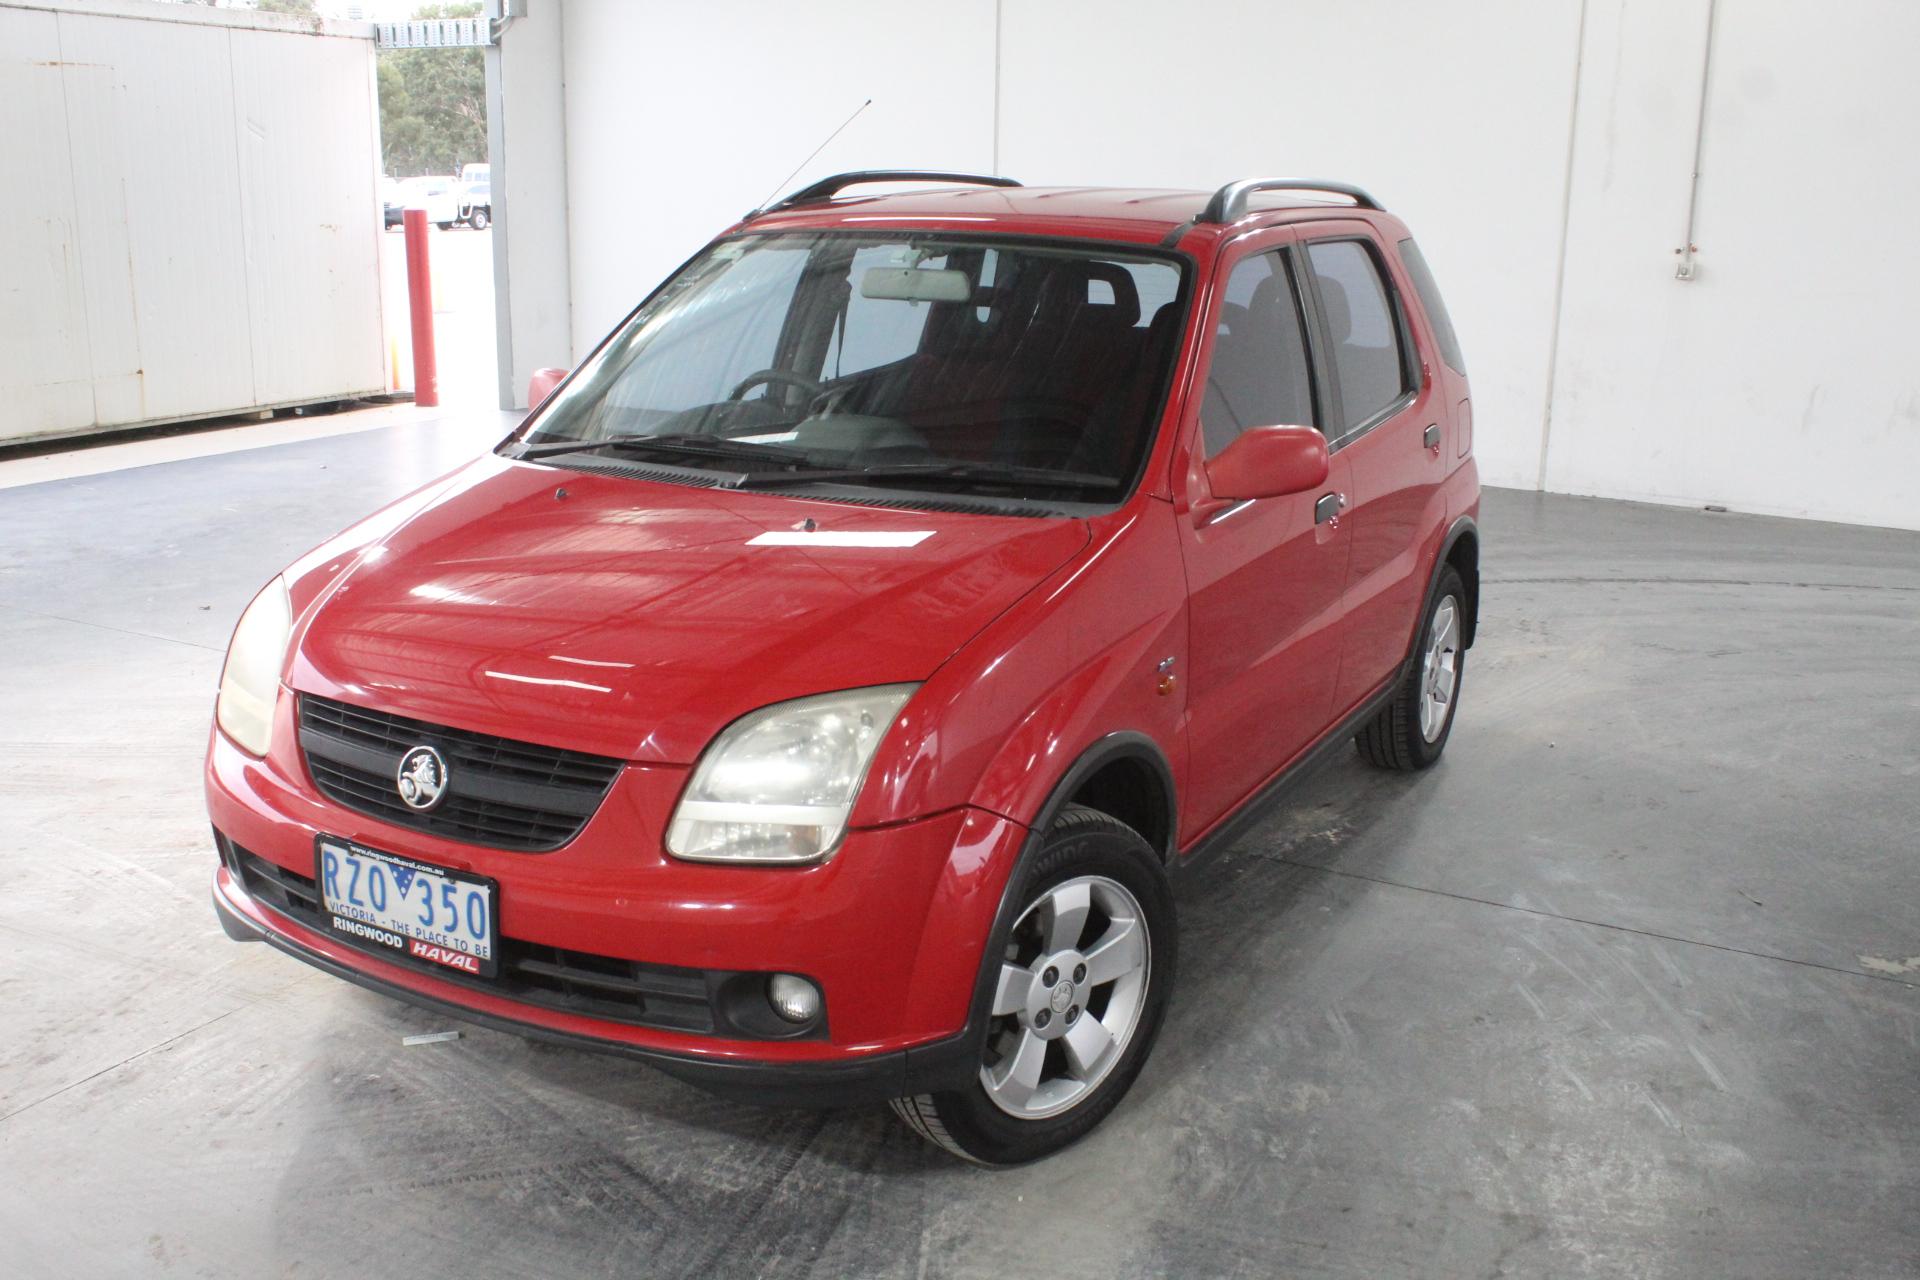 2002 Holden Cruze YG Automatic Wagon (RWC 28-6-19)